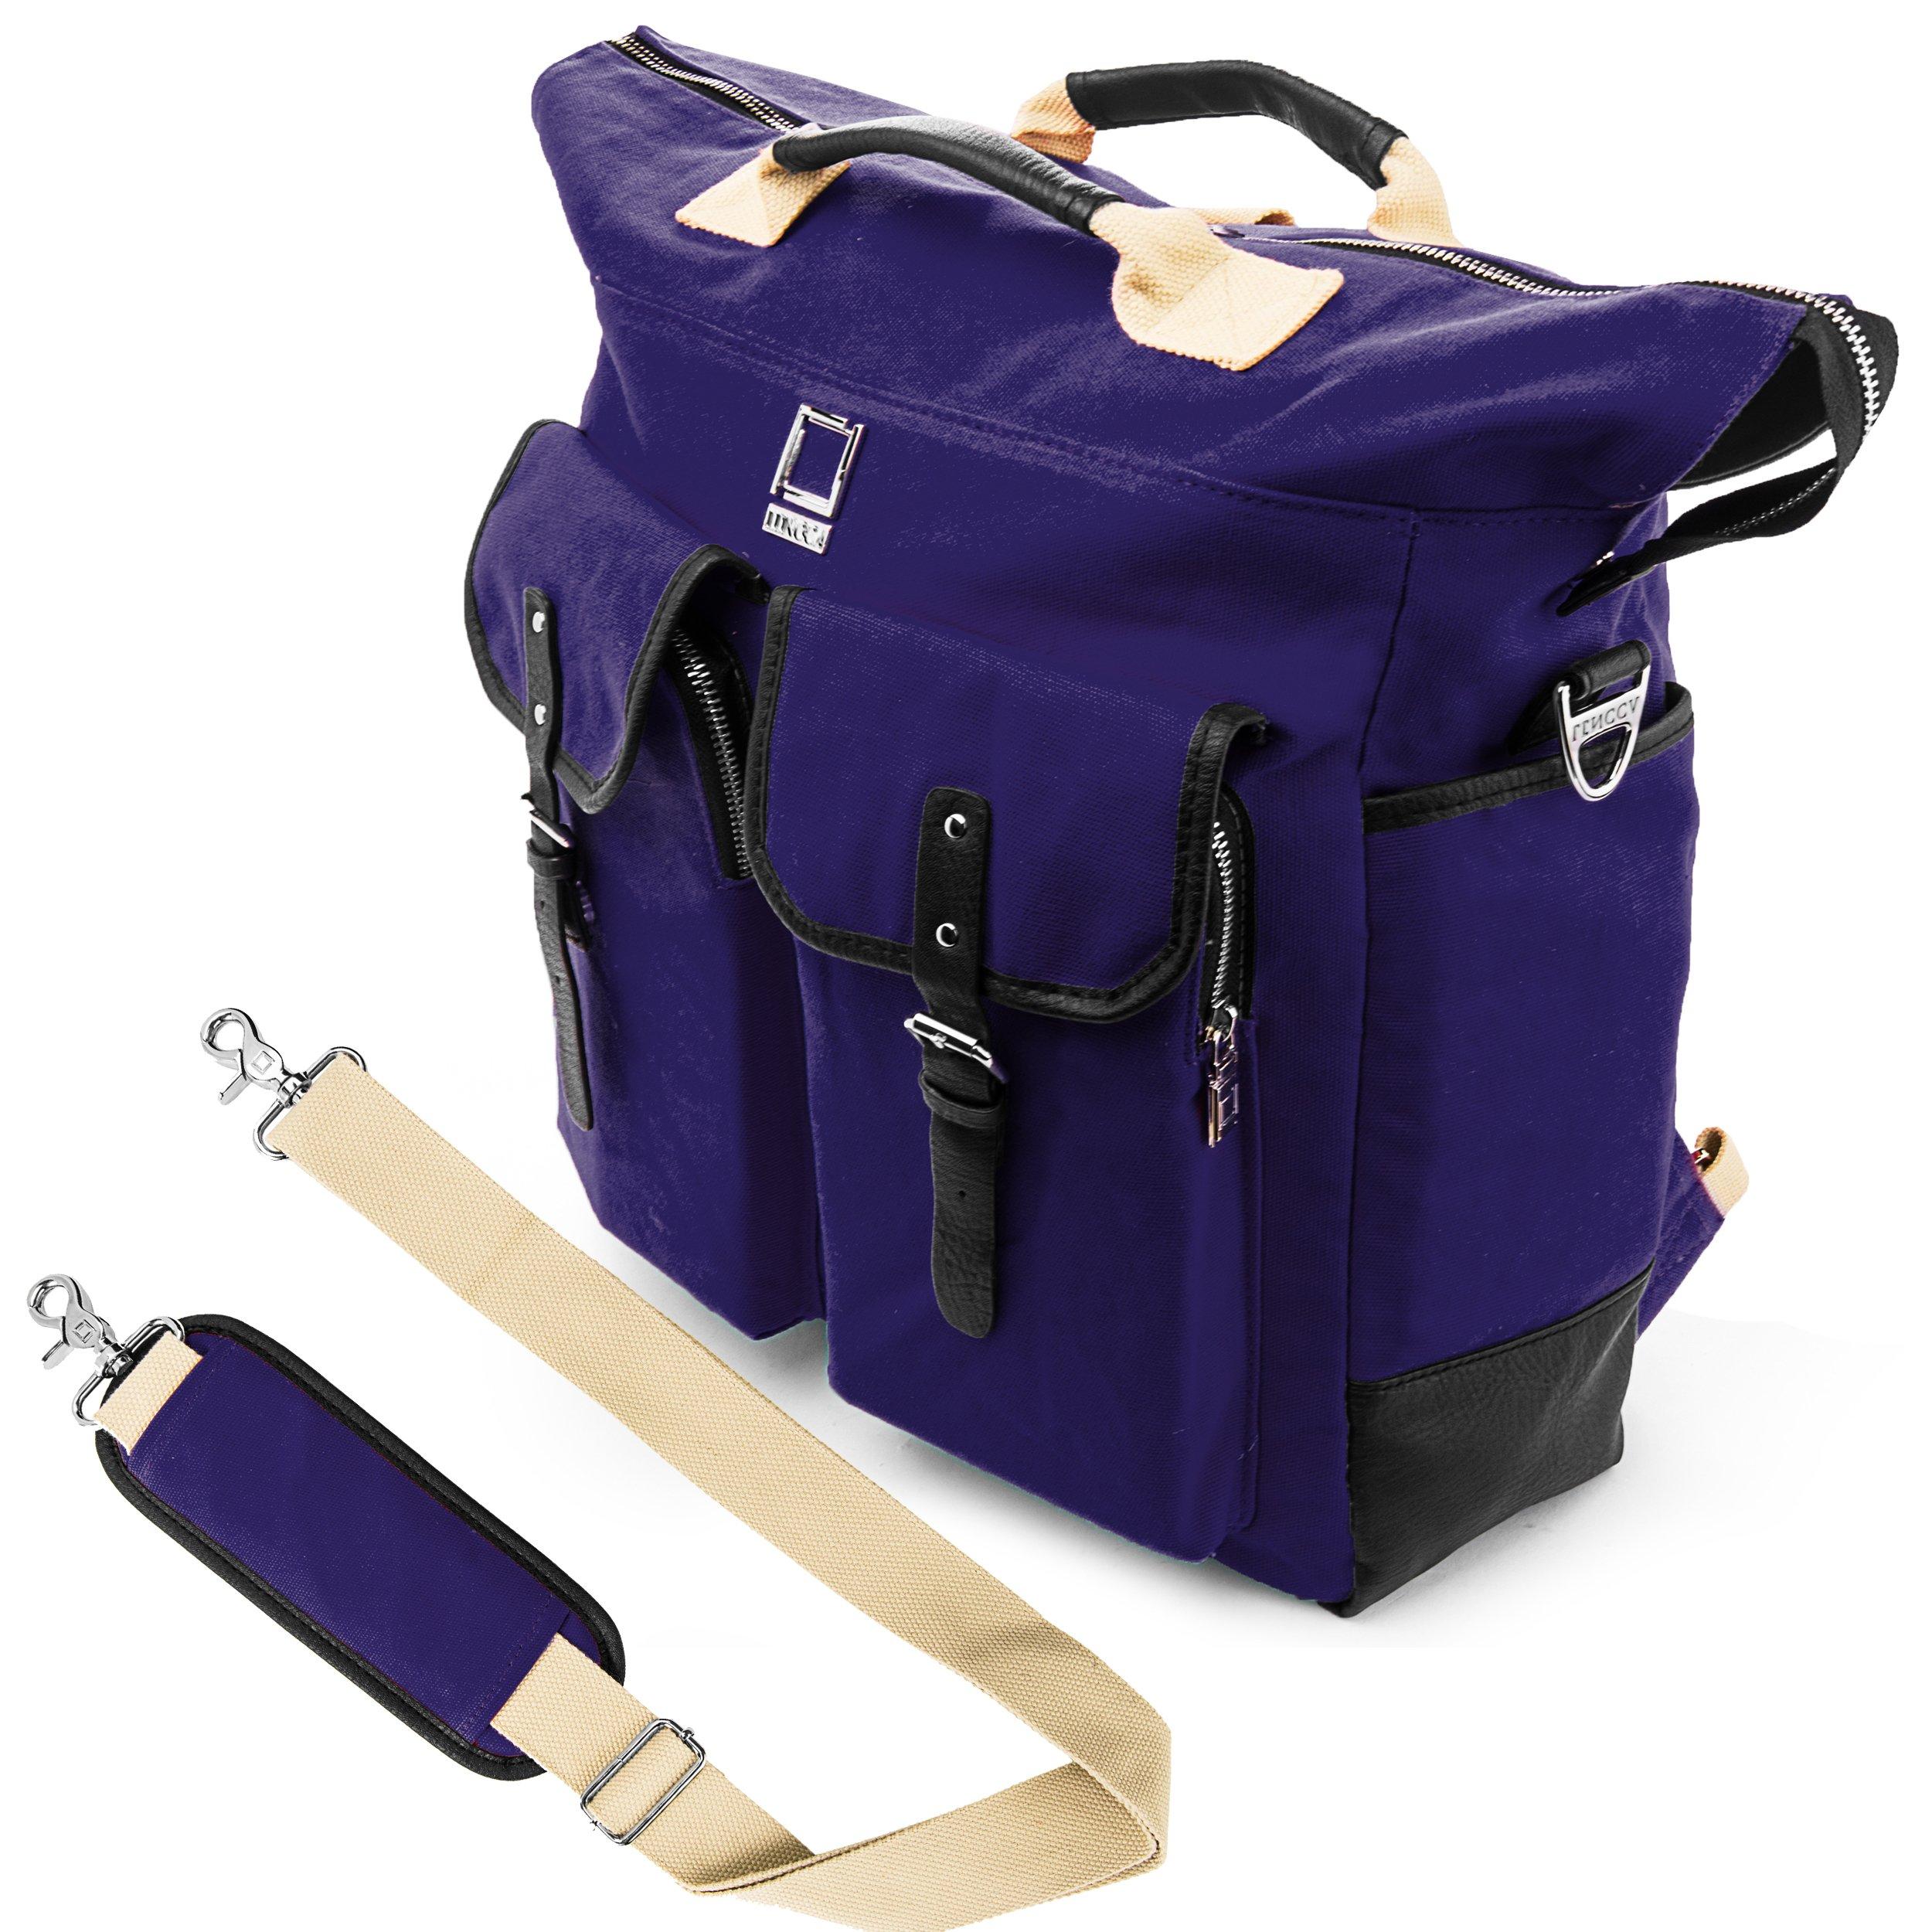 Lencca Universal Hybrid 3 in 1Design Carrying / Tote / Messenger / Crossbody / Backpack / Shoulder Bag for Apple Macbook Pro series 15.4 / 13.3 inch Mac OS X Laptop (Royal Blue)